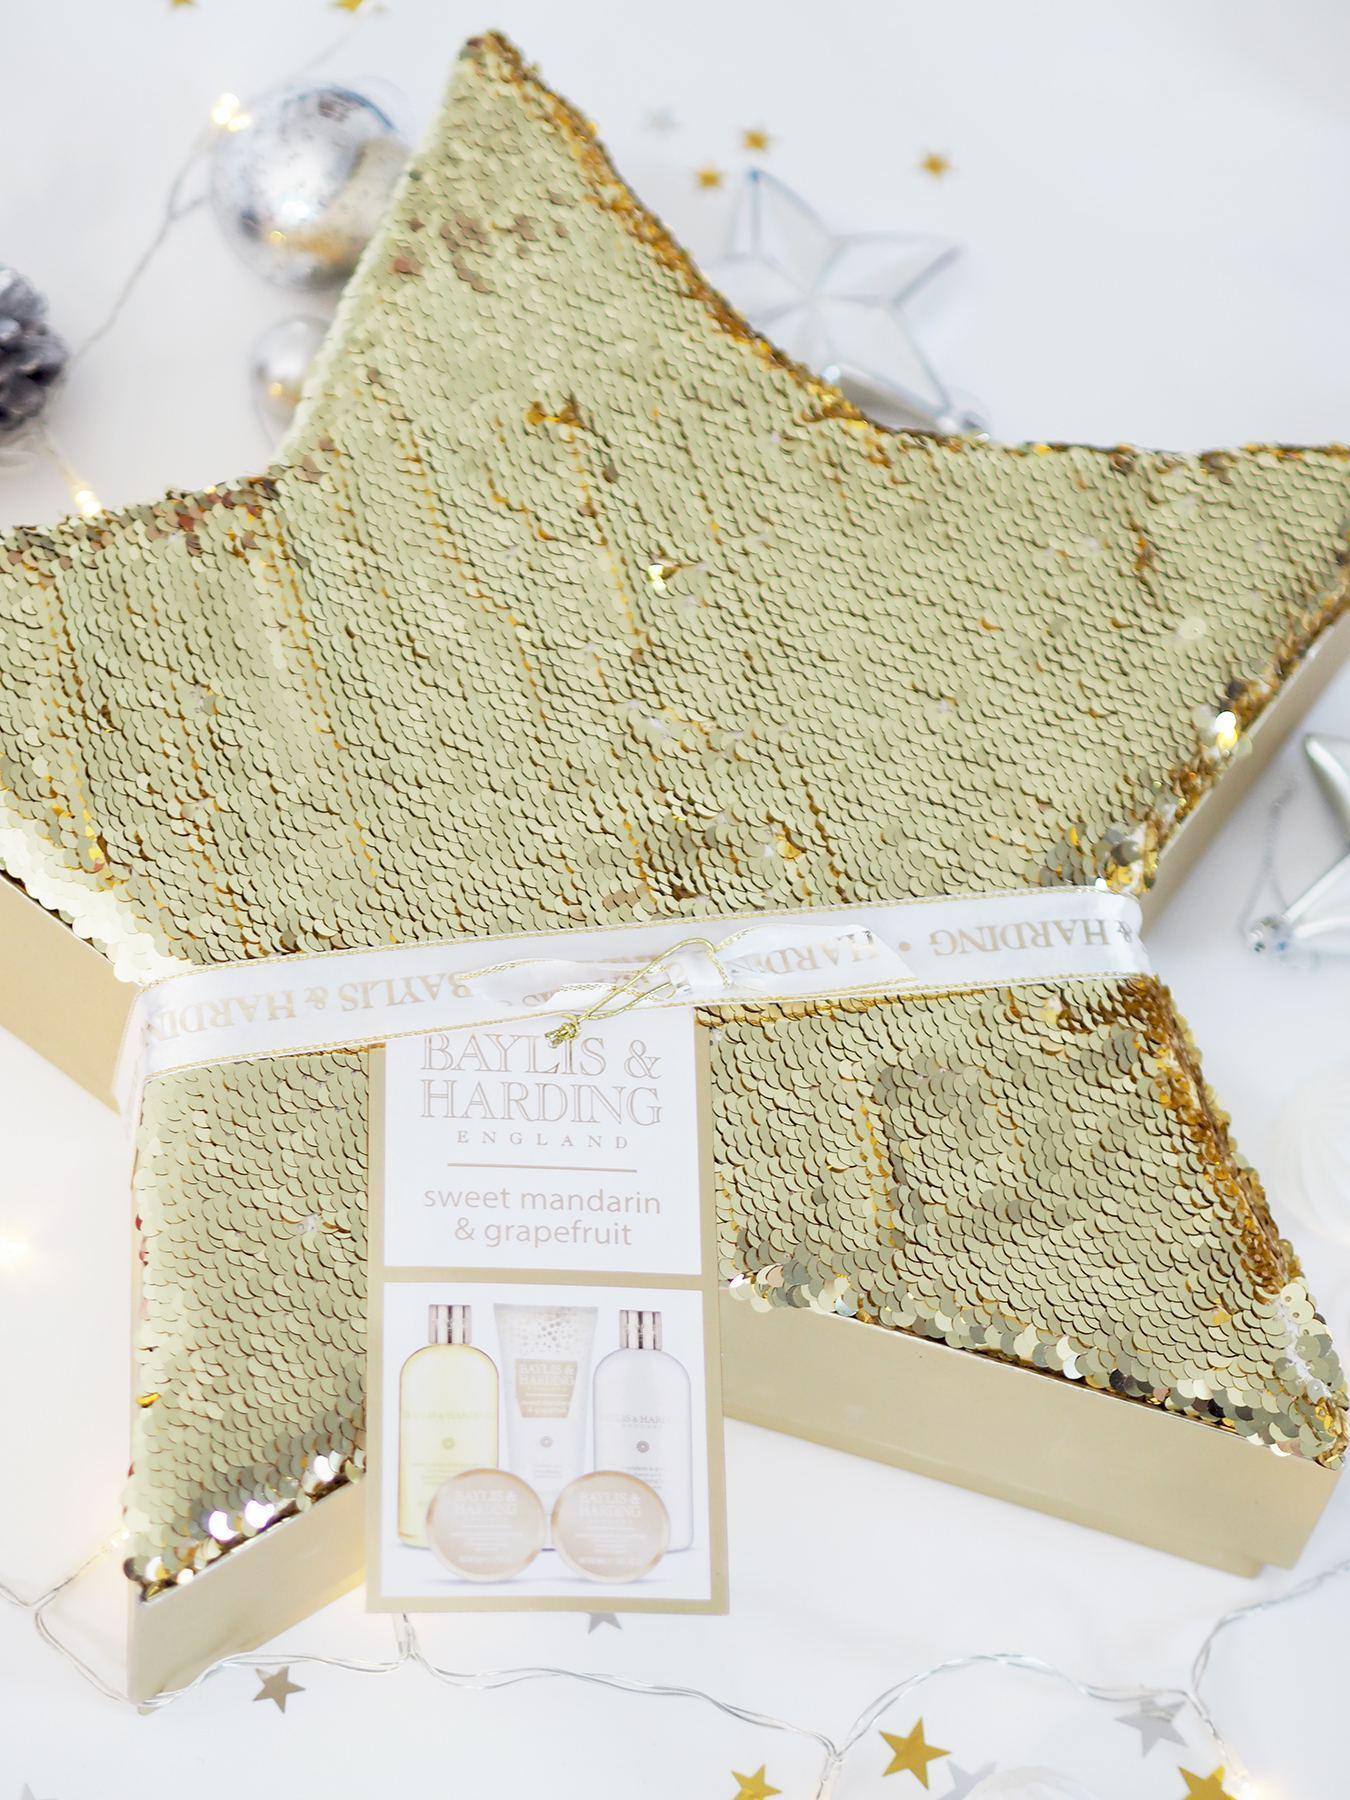 bayliss and harding star gift set